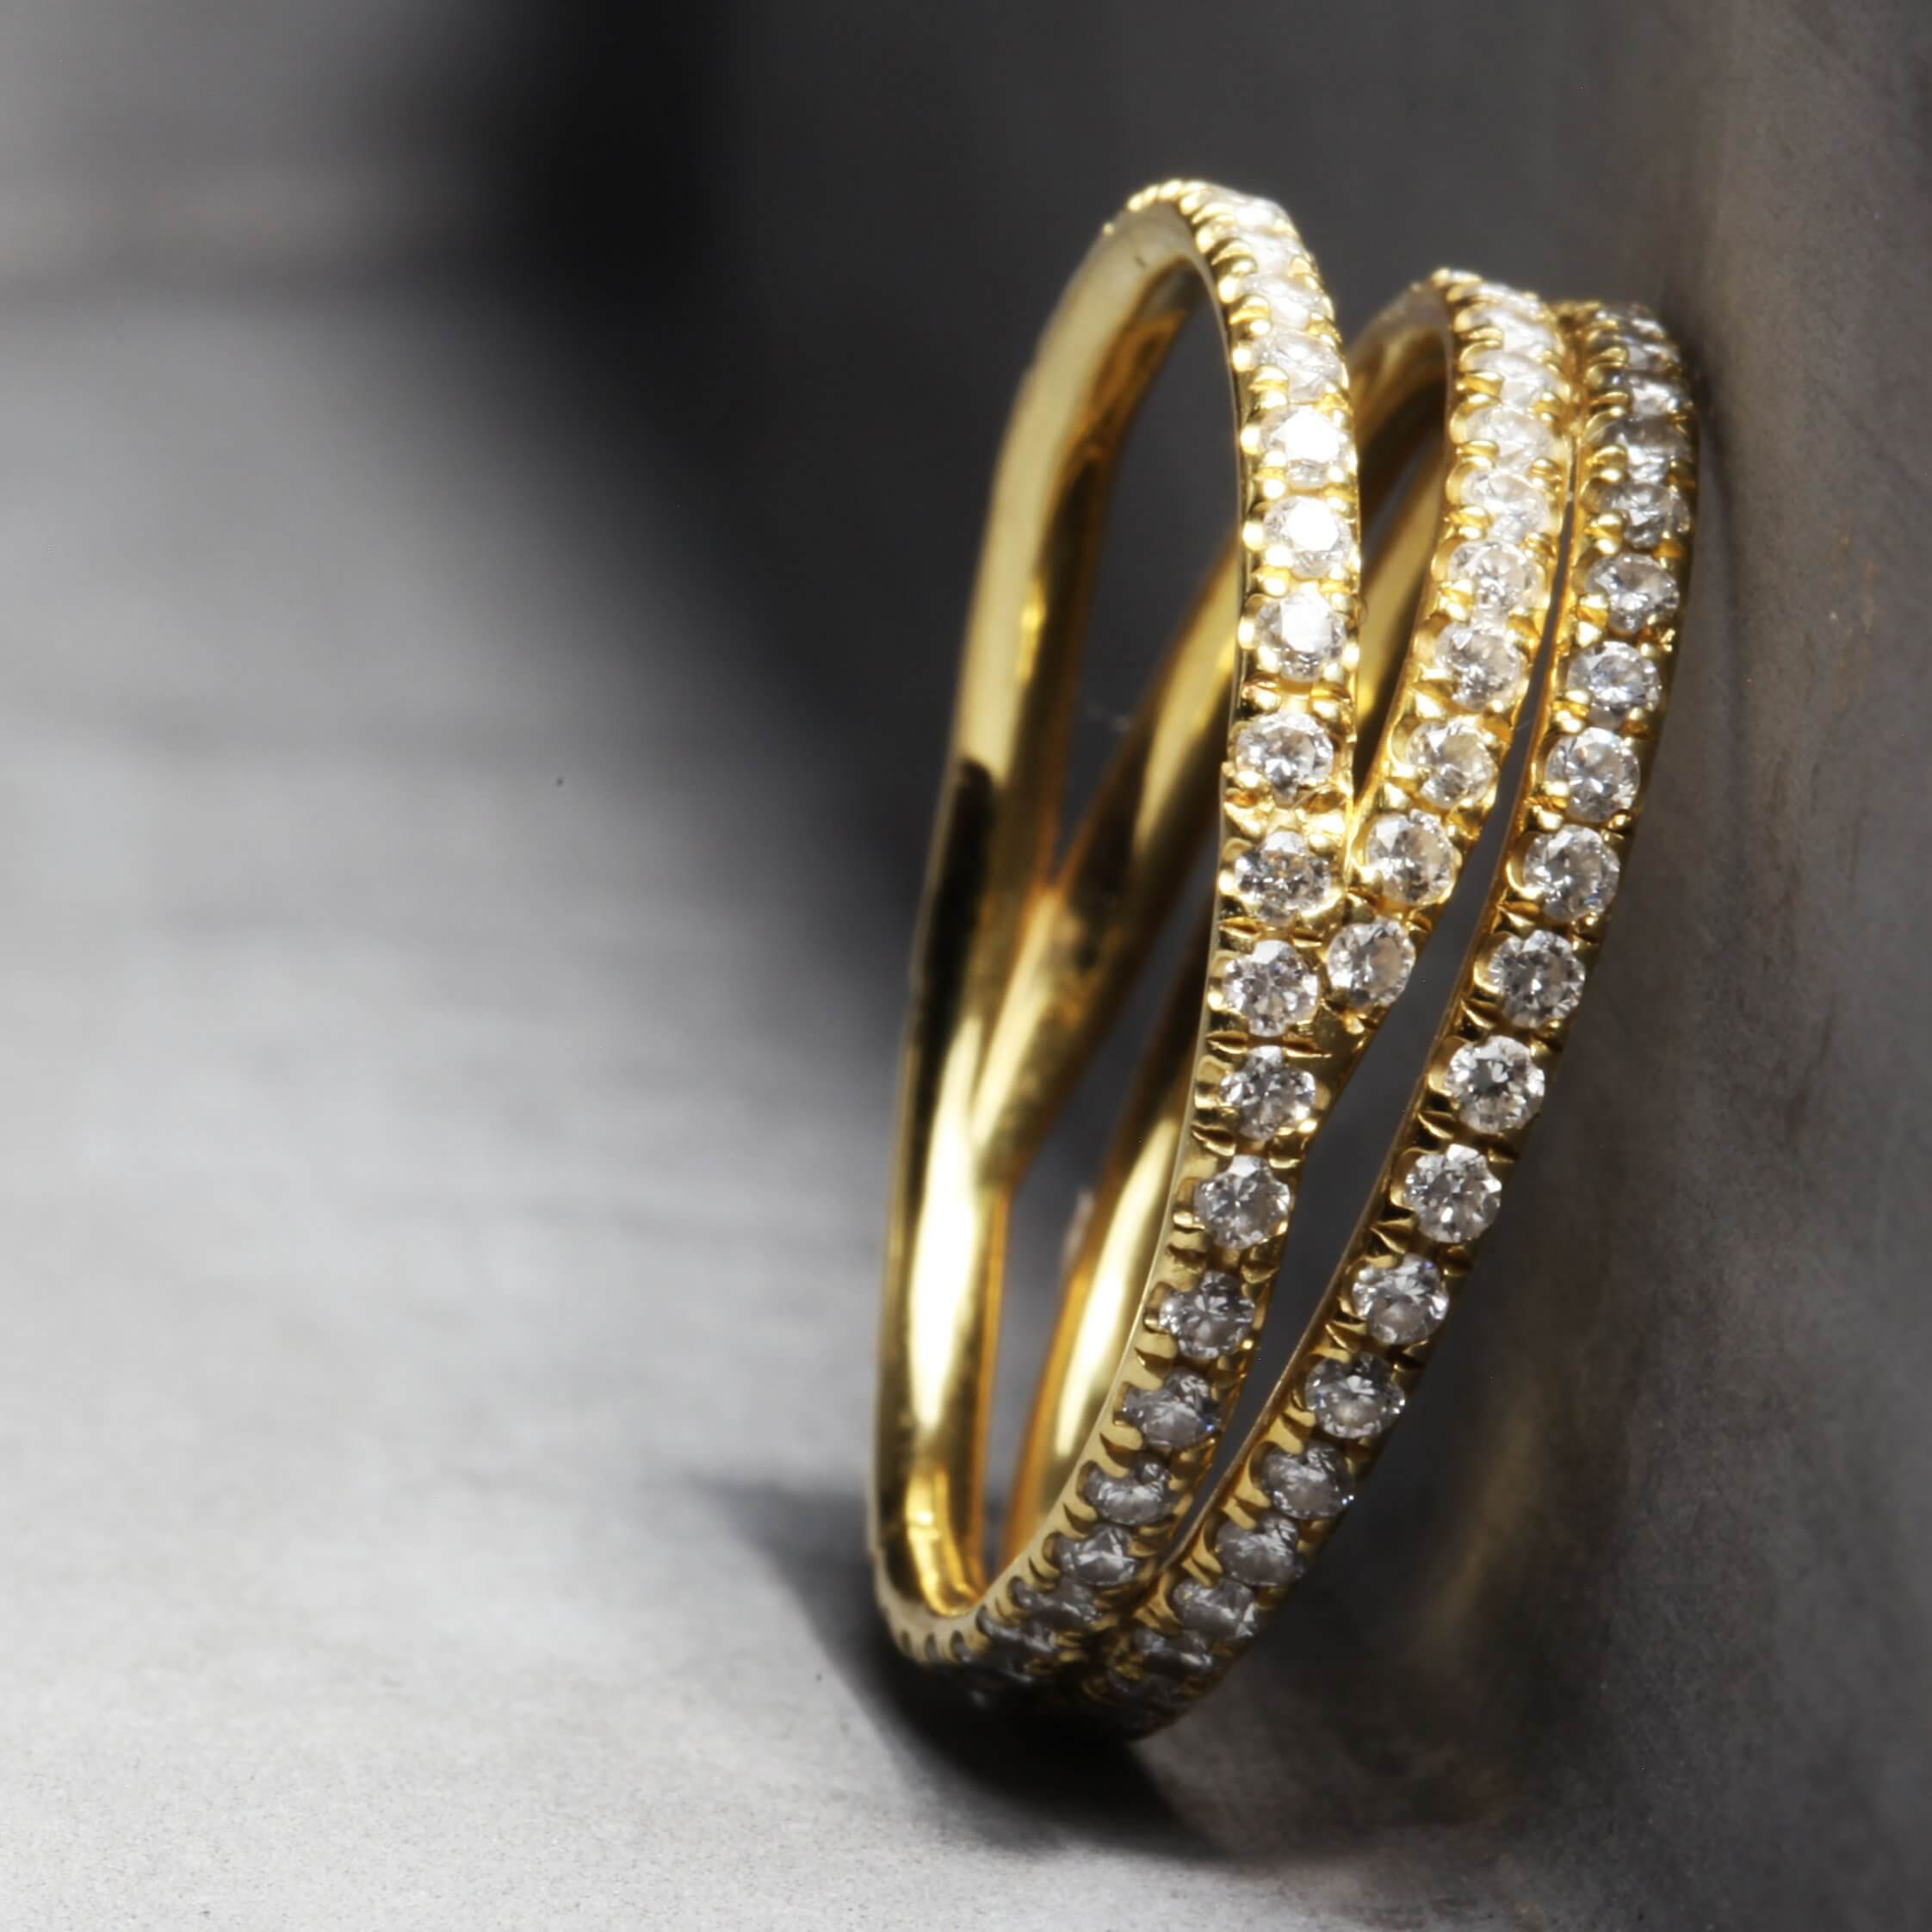 MAJA BOND | Grace Ring - Yellow Gold with White Diamonds